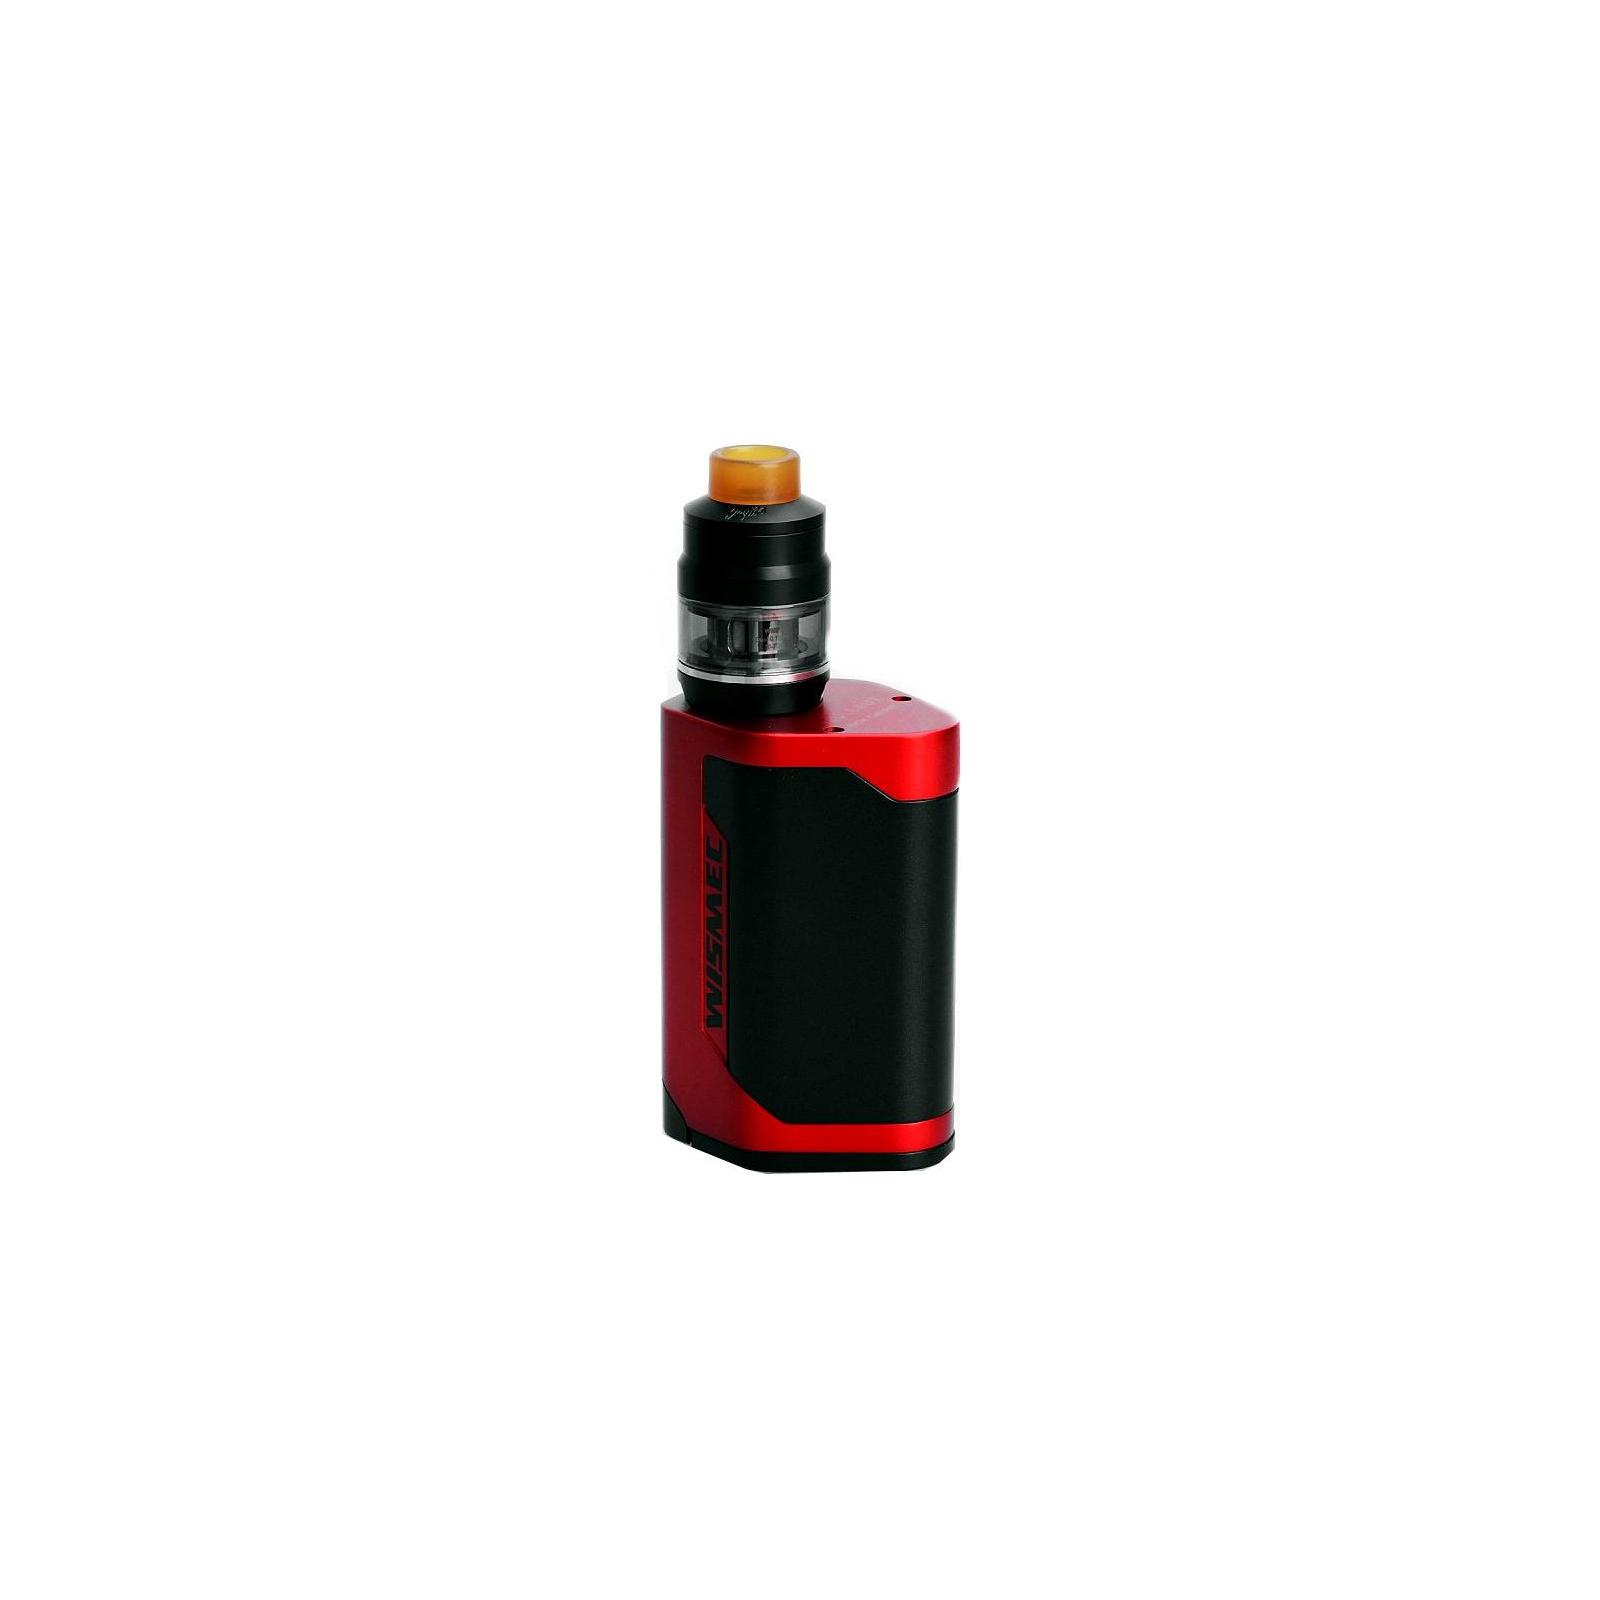 Стартовый набор Wismec Reuleaux RX Gen3 with Gnome Tank Kit Red (WISRXG3GRD) изображение 2